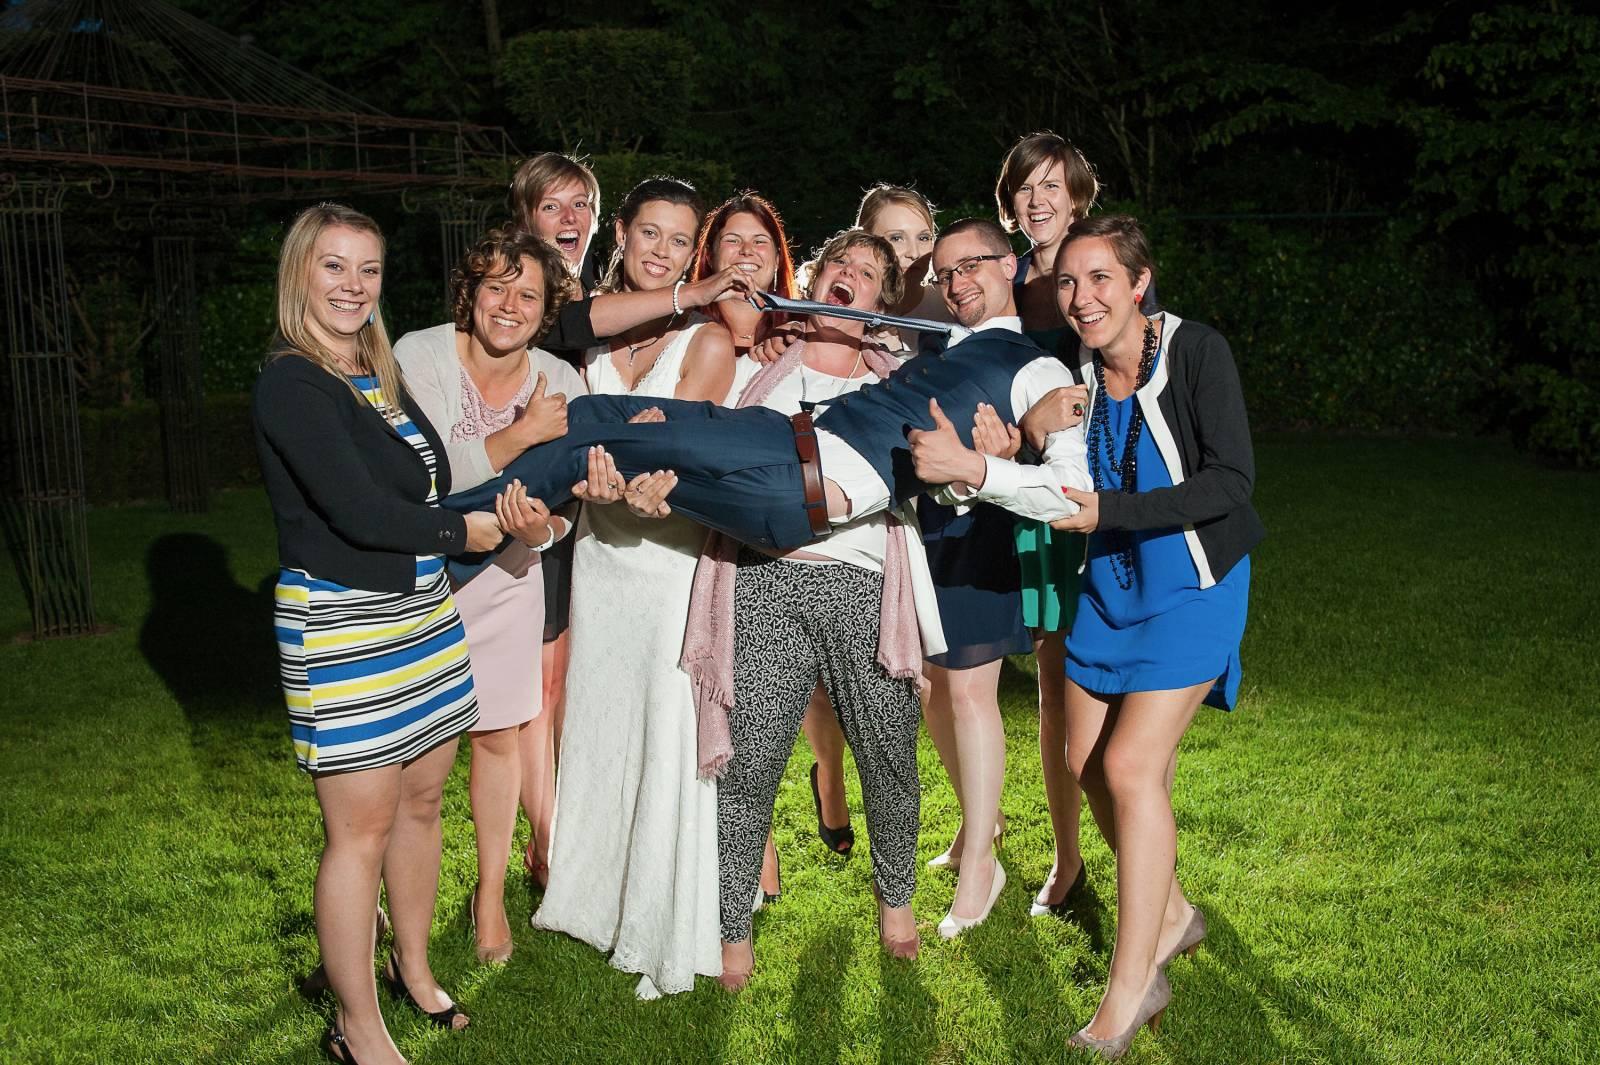 Foto Meeuw - House of Weddings - 13